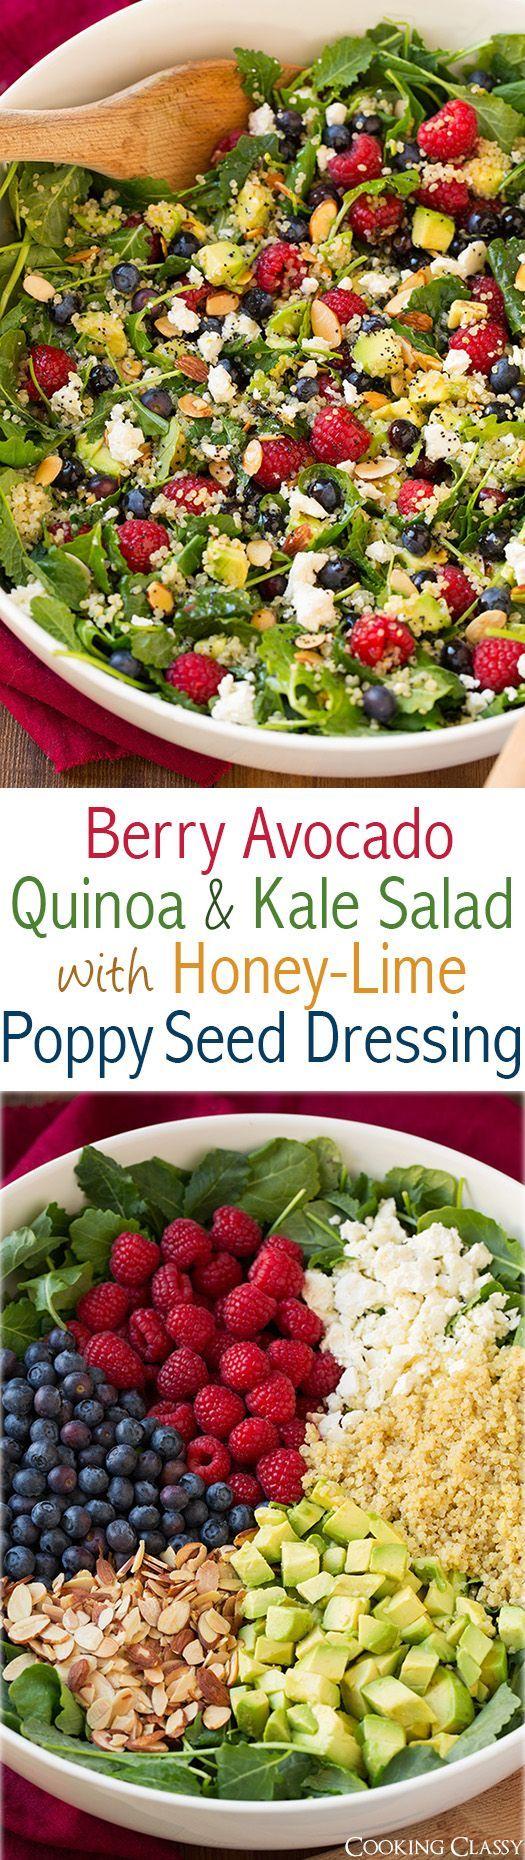 Honeydew Salad With Poppy Seed Dressing Recipe — Dishmaps